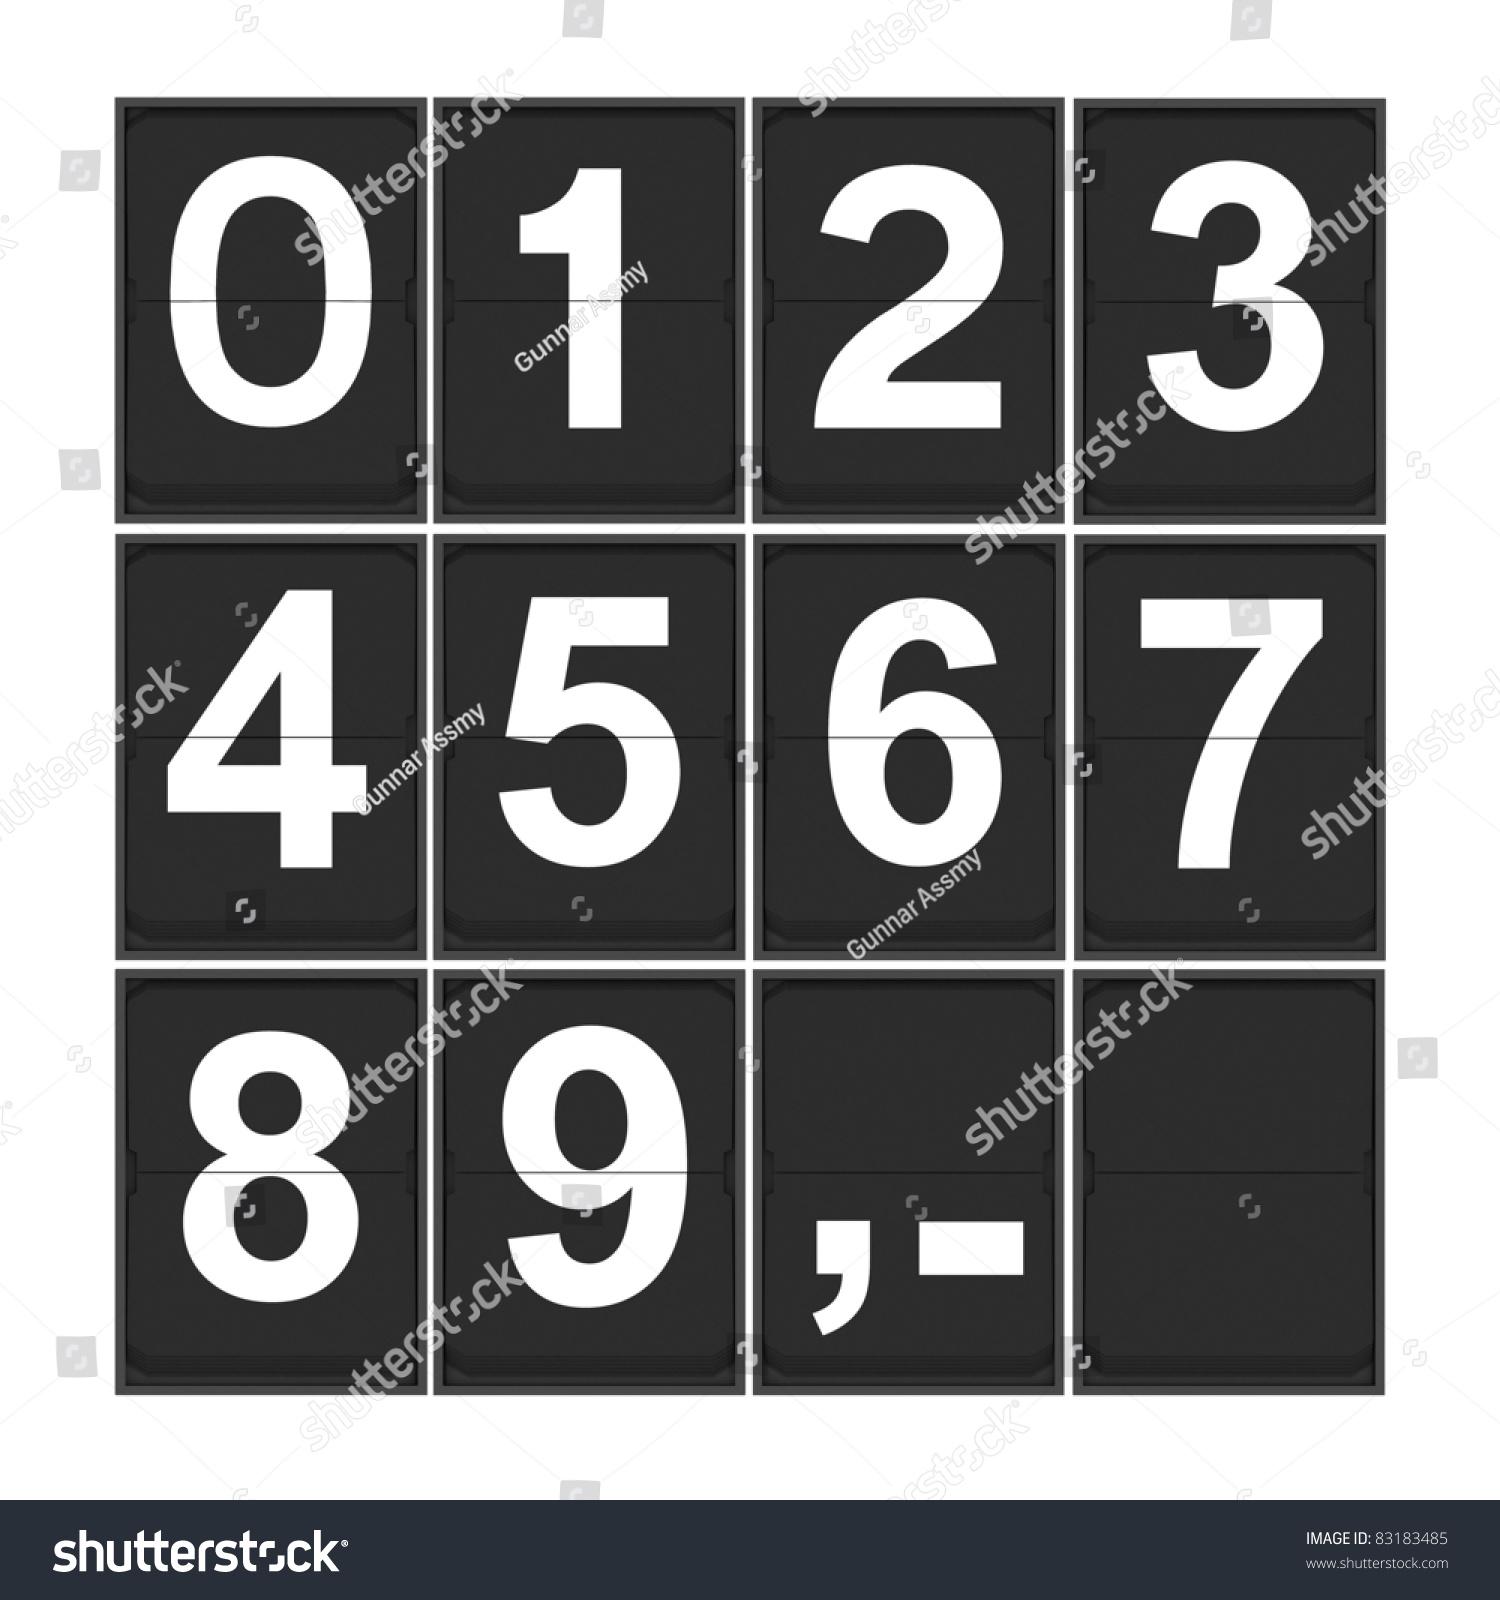 Flip Clock Number Template Photo 83183485 Shutterstock – Number Template